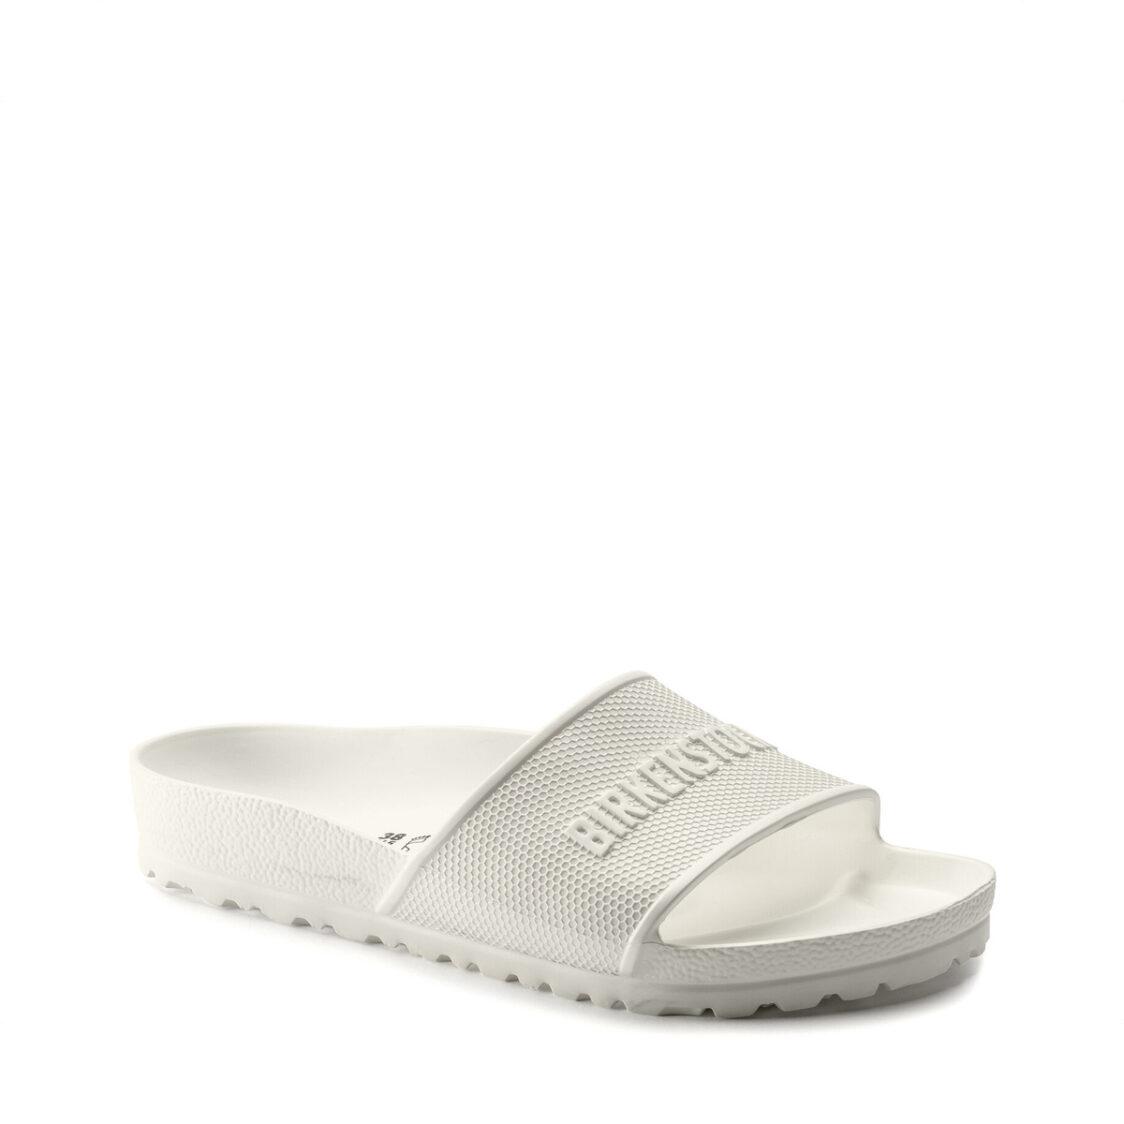 Birkenstock Barbados EVA Unisex Regular Width Sandals White